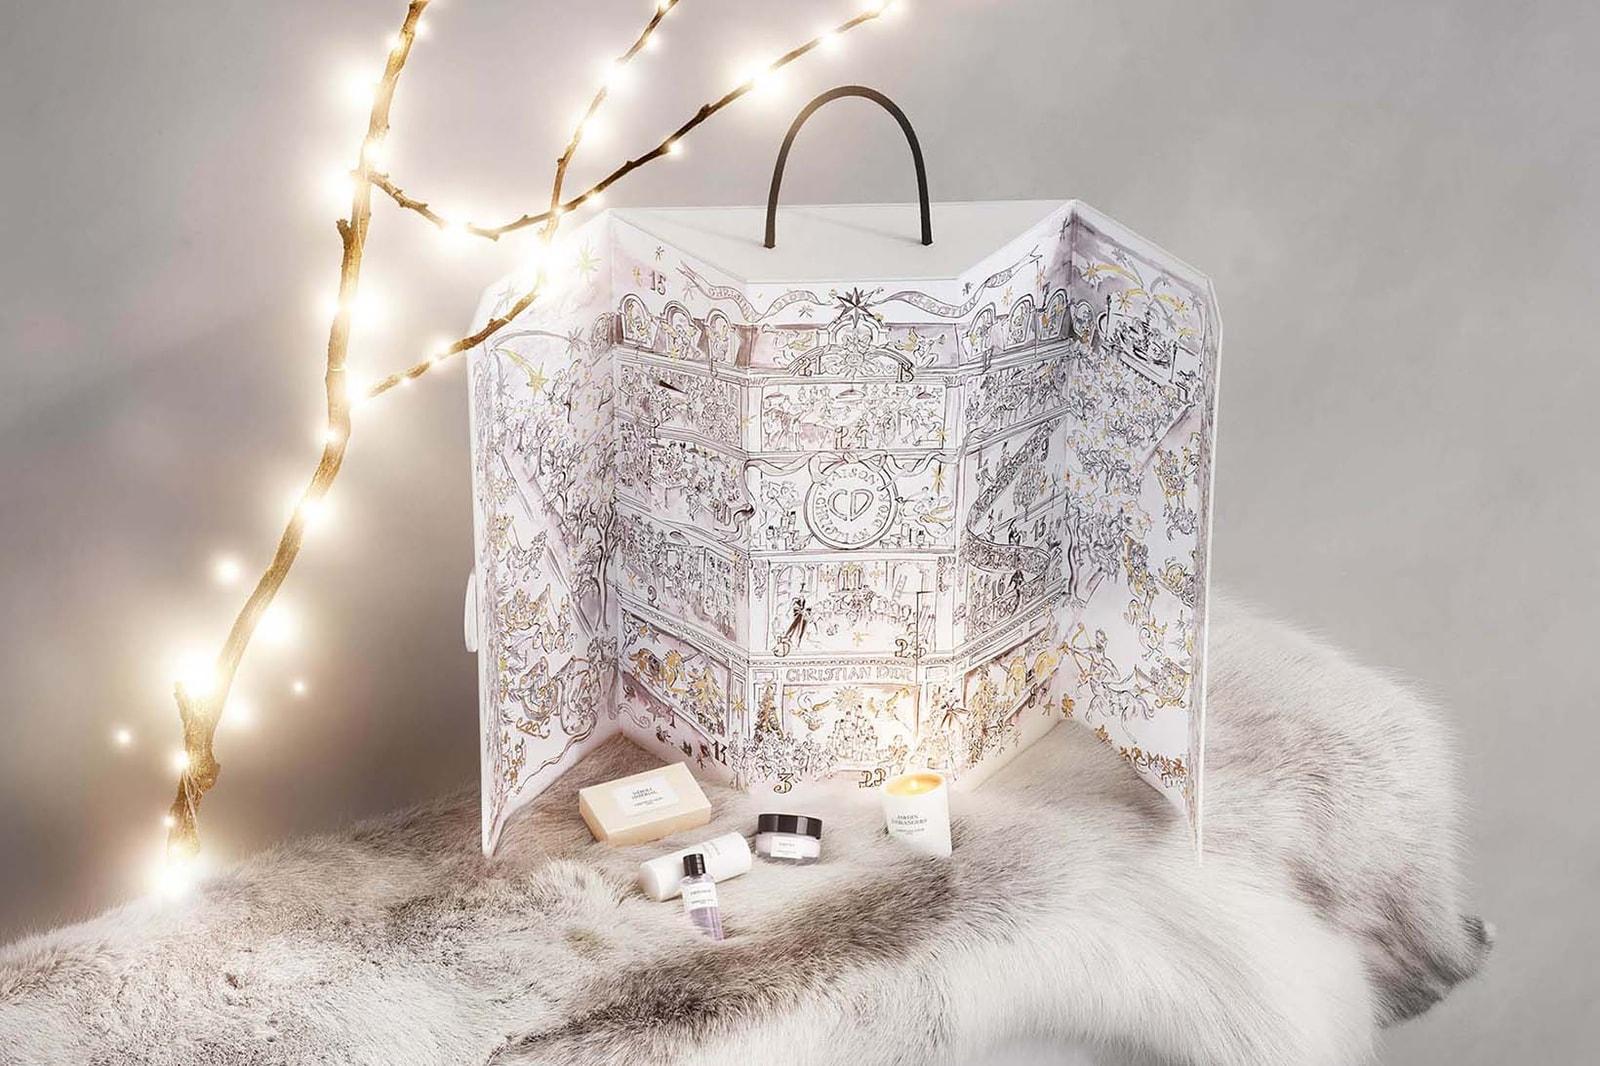 Best Beauty Cosmetics Advent Calendar 2019  Selfridges Charlotte Tilbury Dior Feelunique Dr. Barbara Sturm